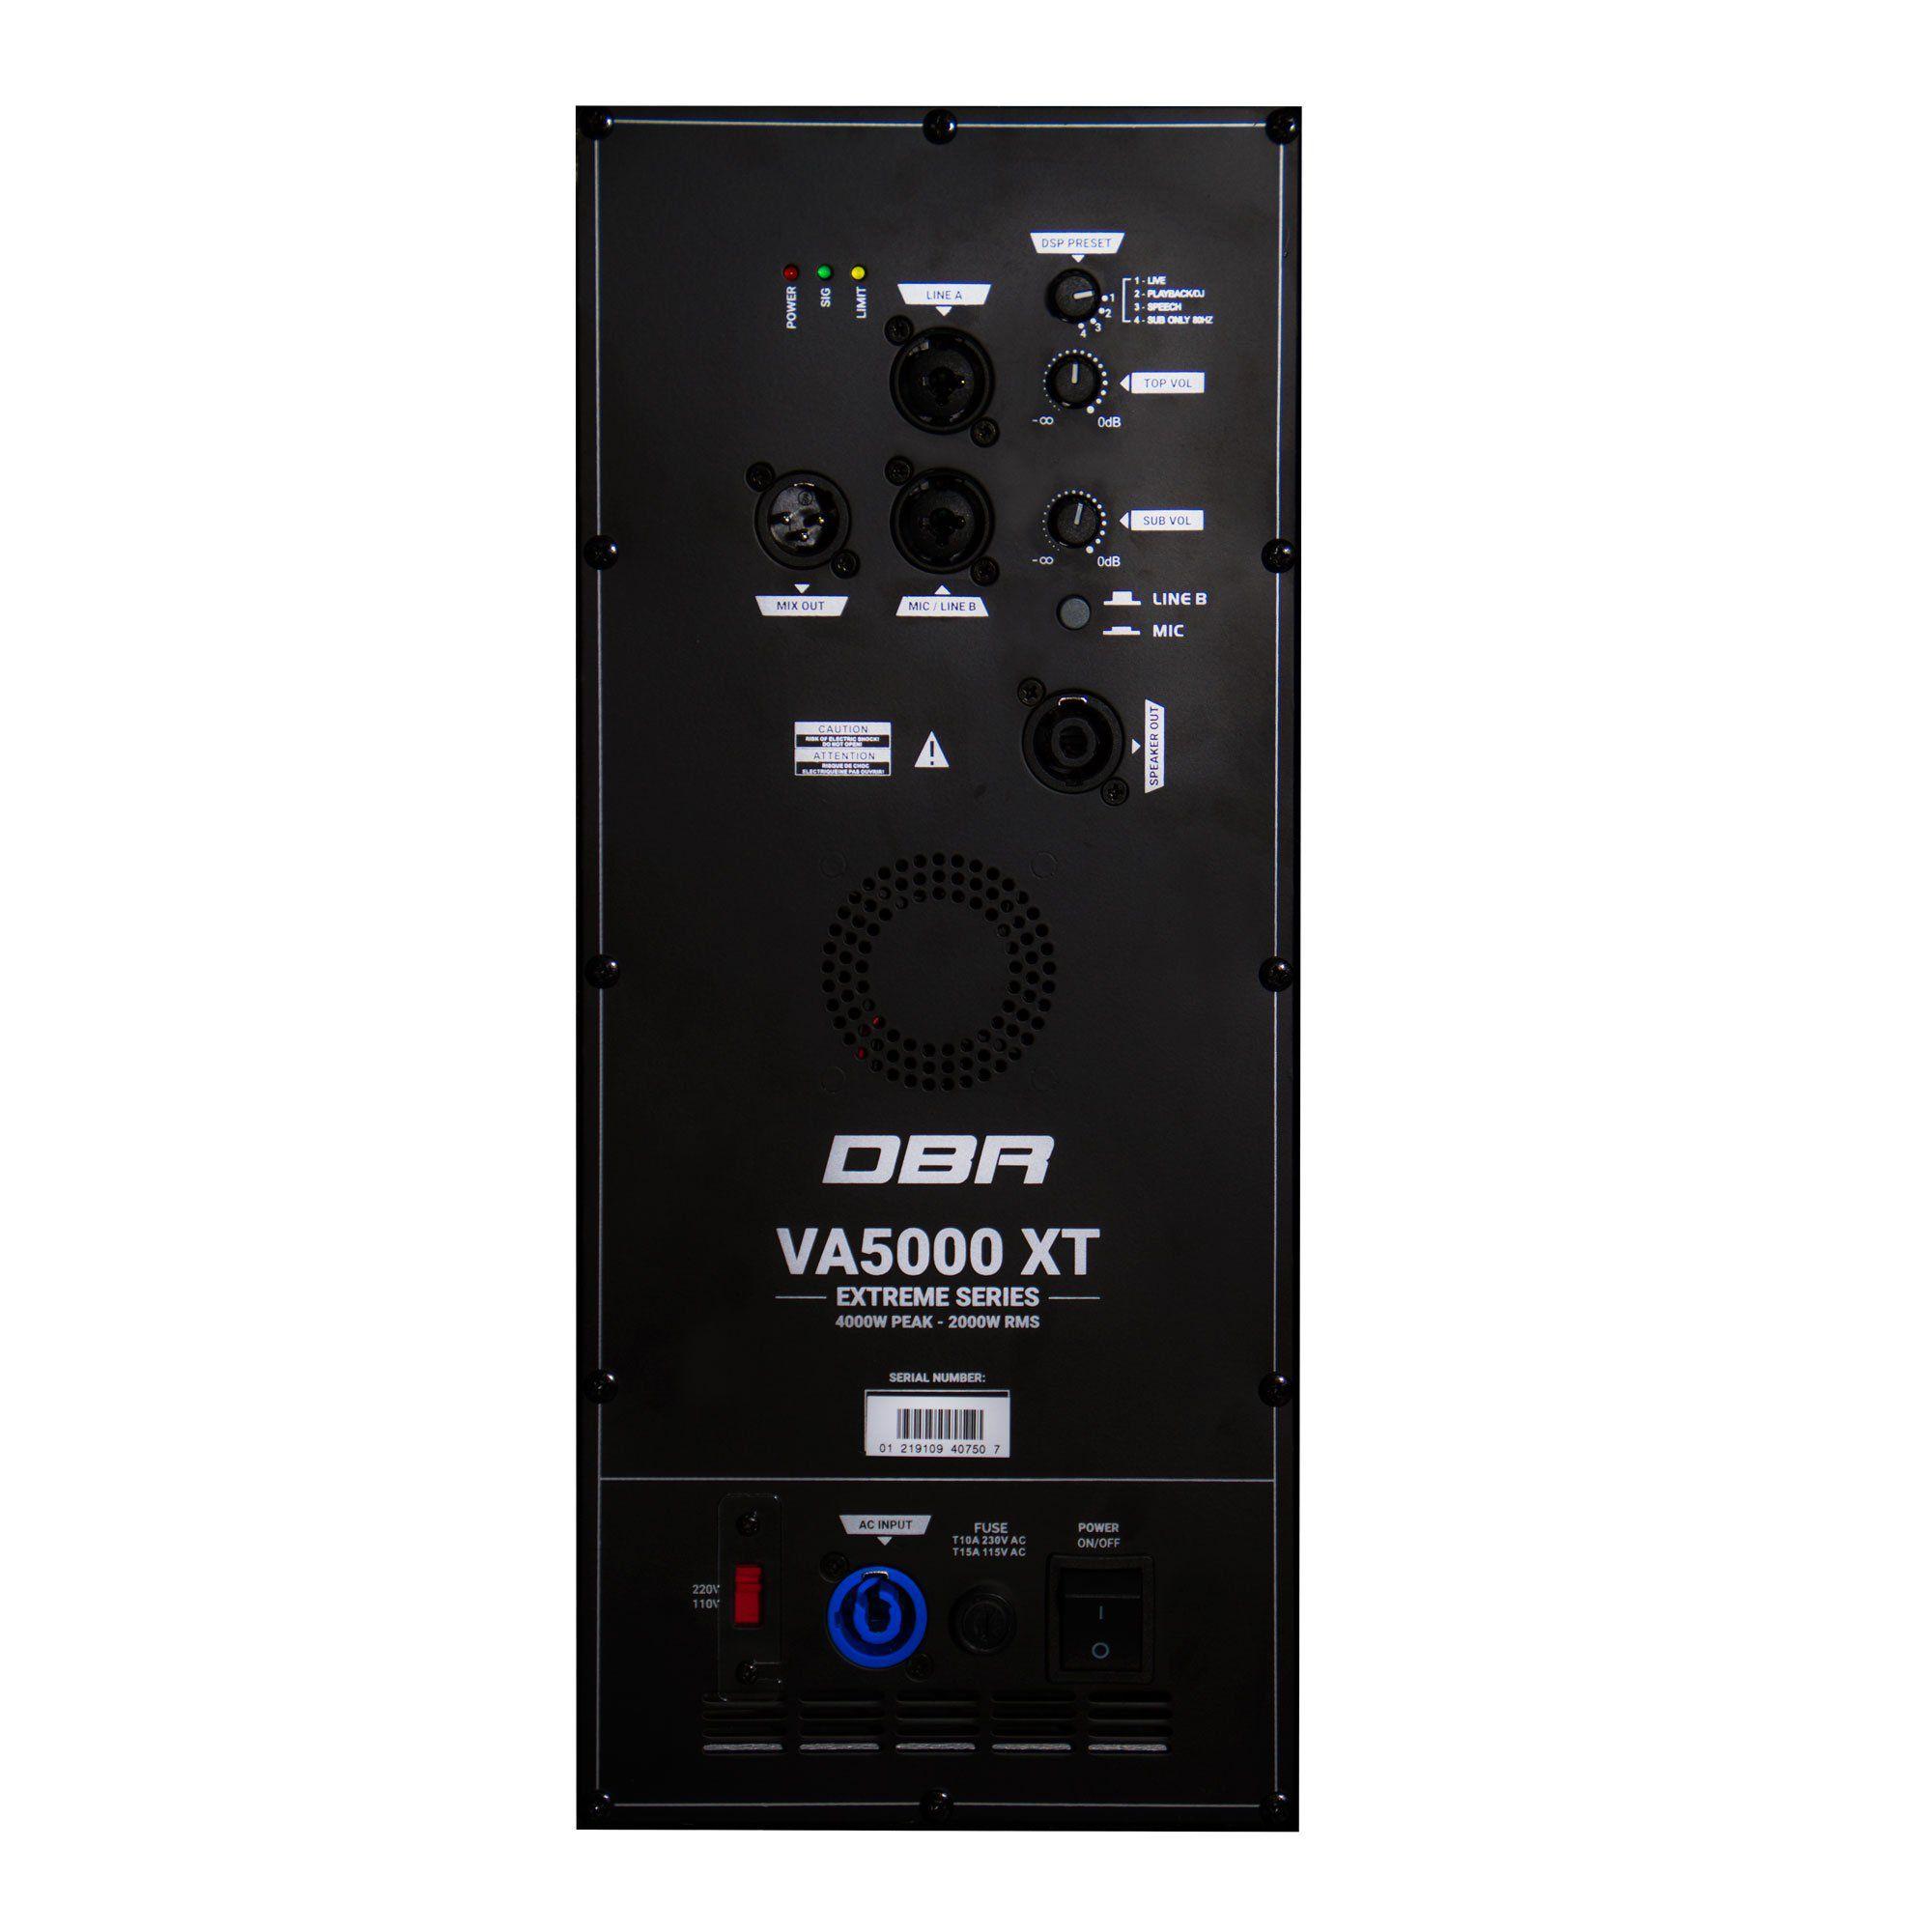 Sistema de Som Profissional 2000W –VA5000 XT - DBR